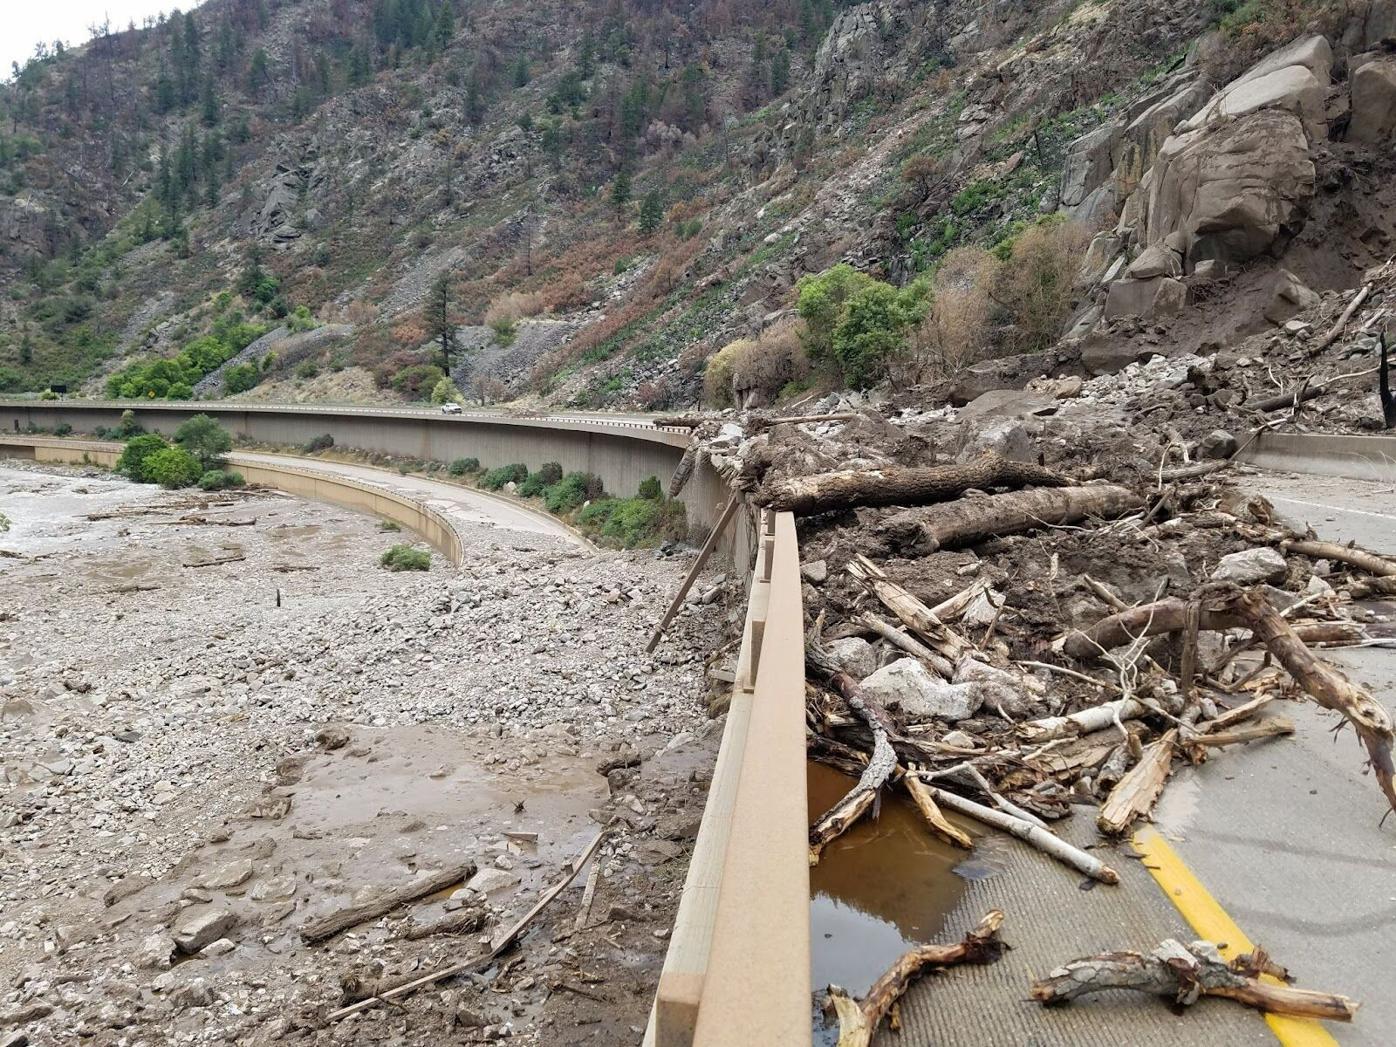 I-70 Damage from mudslides July 2021 (Photo) Courtesy Colorado Department of Transportation.